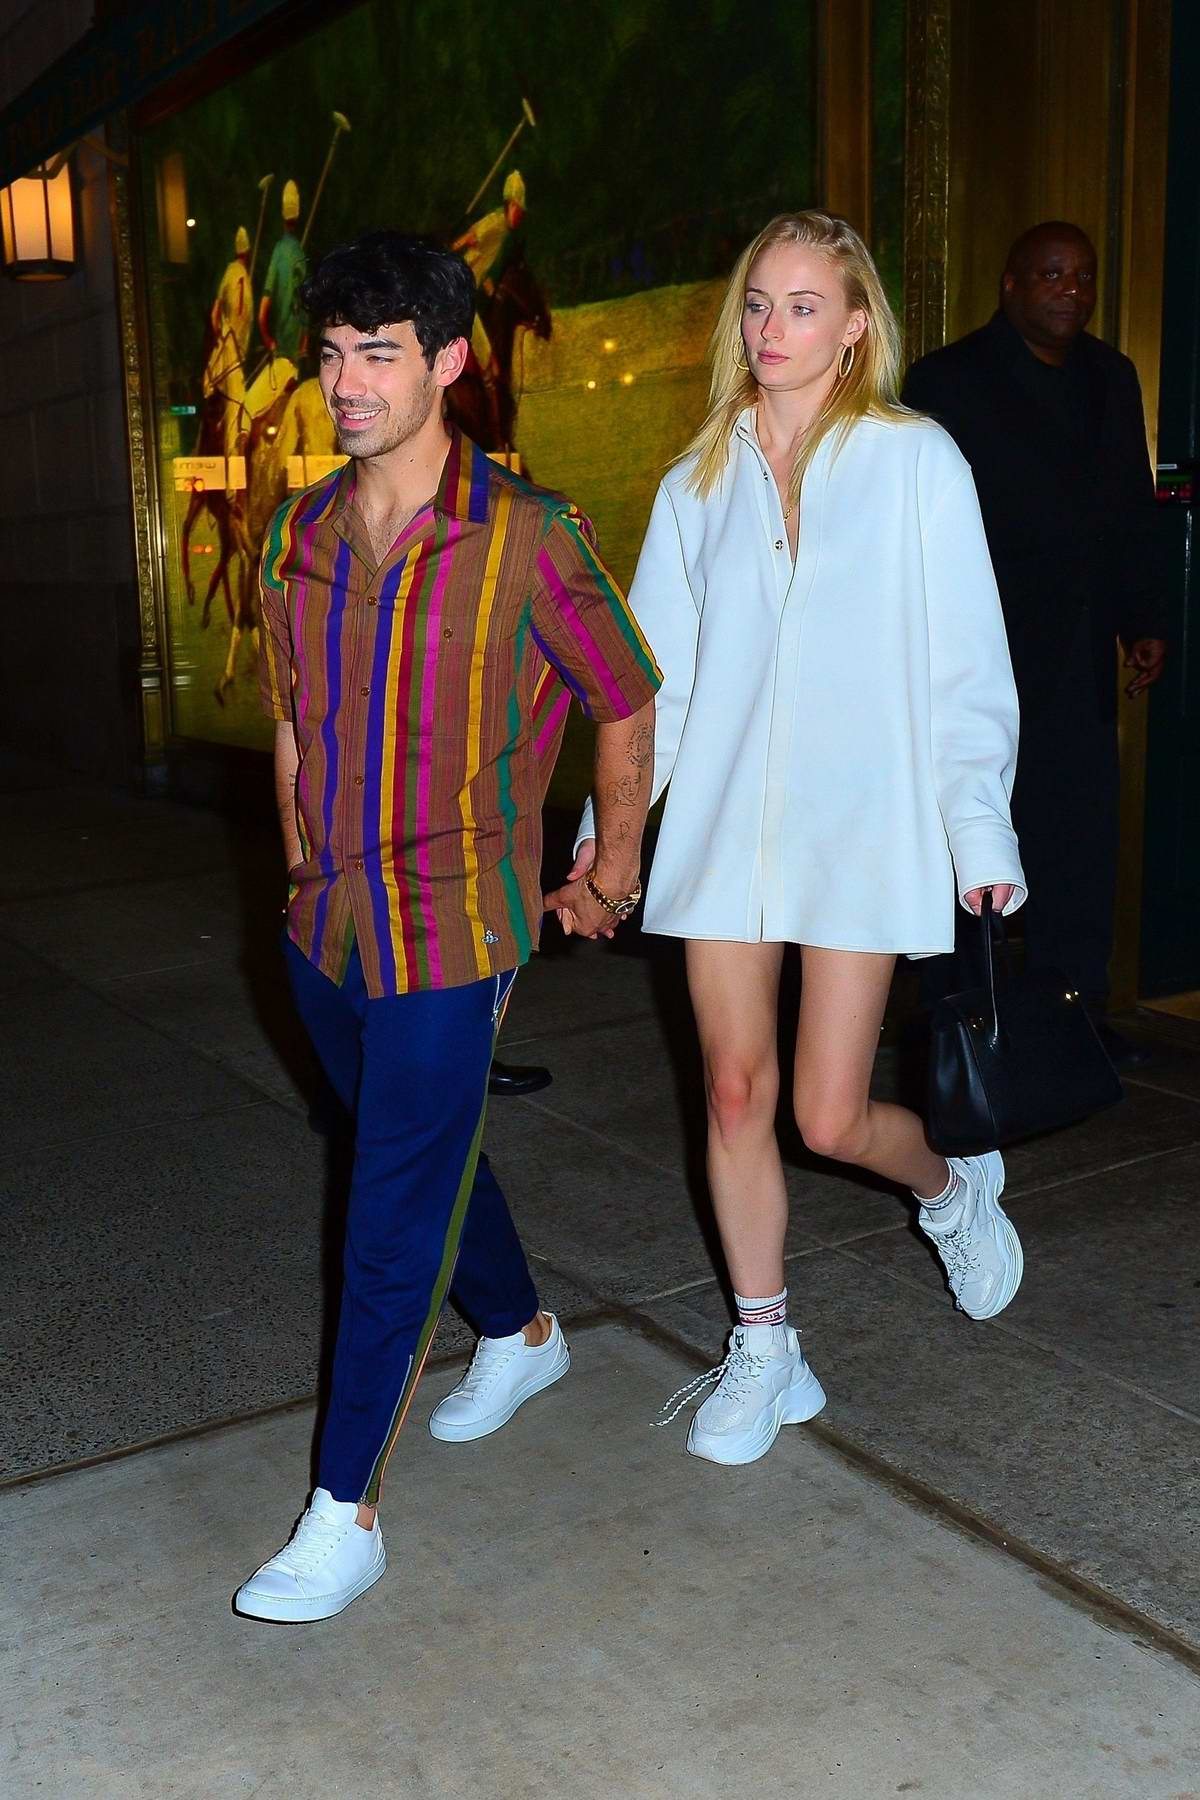 Sophie Turner, Joe Jonas, Priyanka Chopra, and Nick Jonas have a double date night in New York City